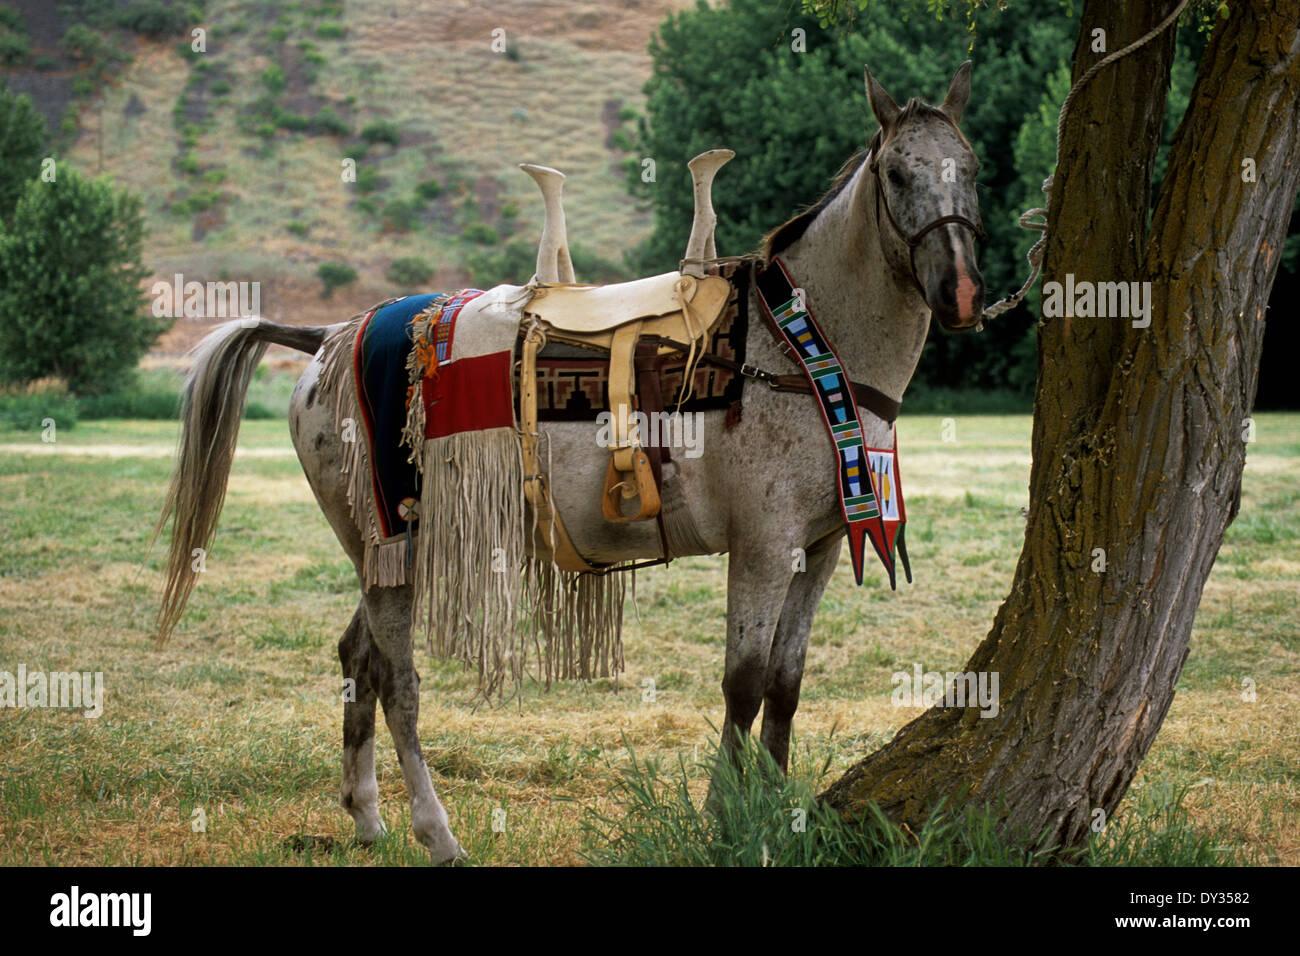 Appaloosa horse in full Nez Perce Indian regalia wearing woman's riding saddle - Stock Image